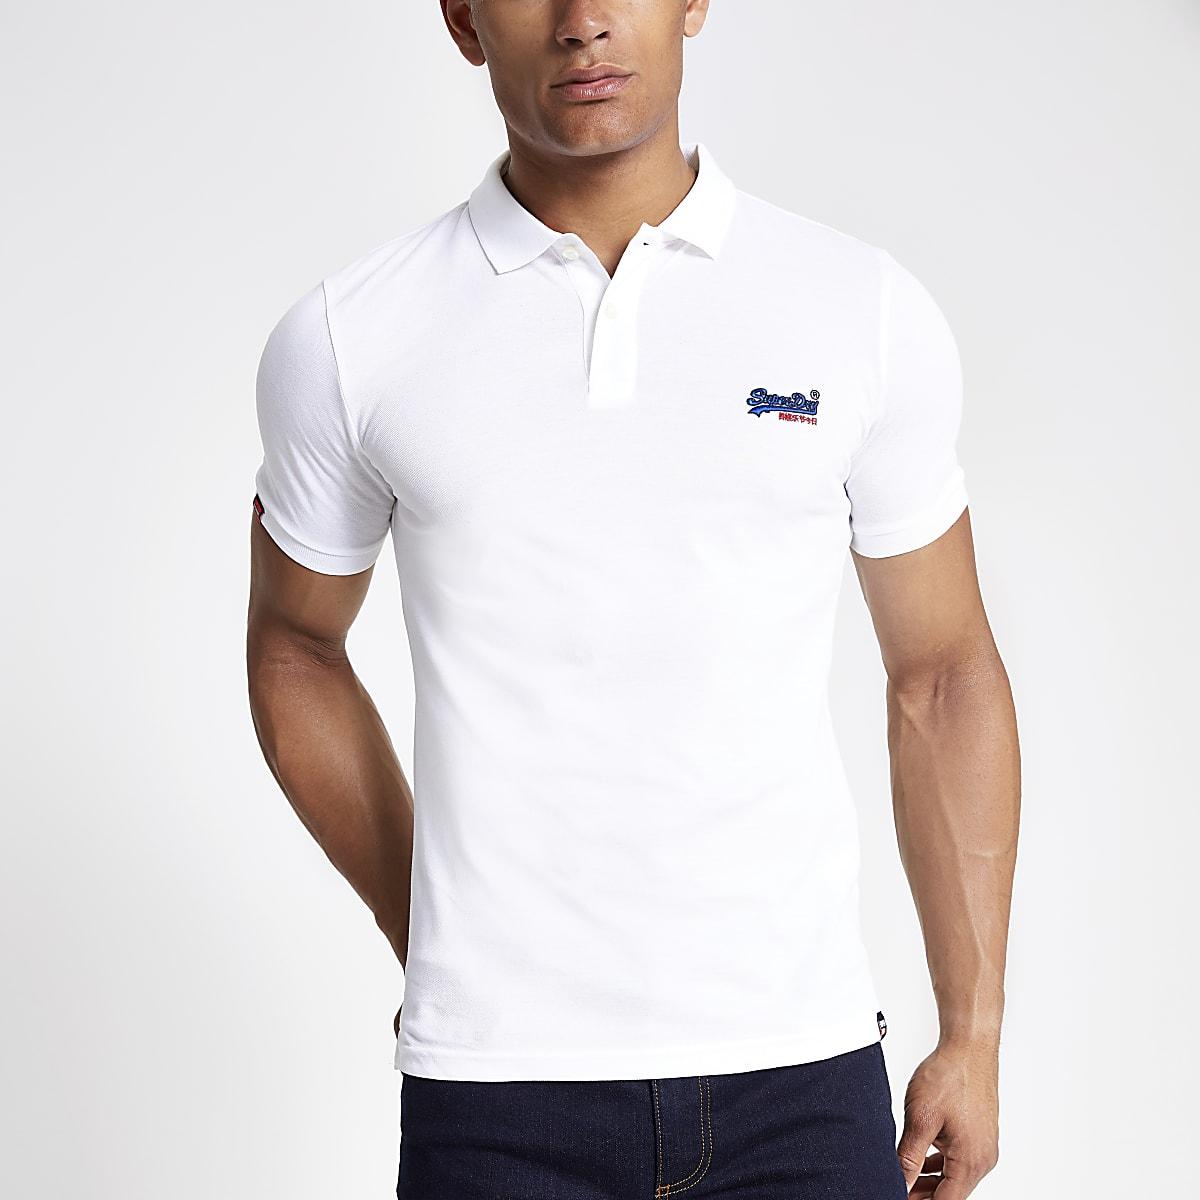 Superdry white polo shirt